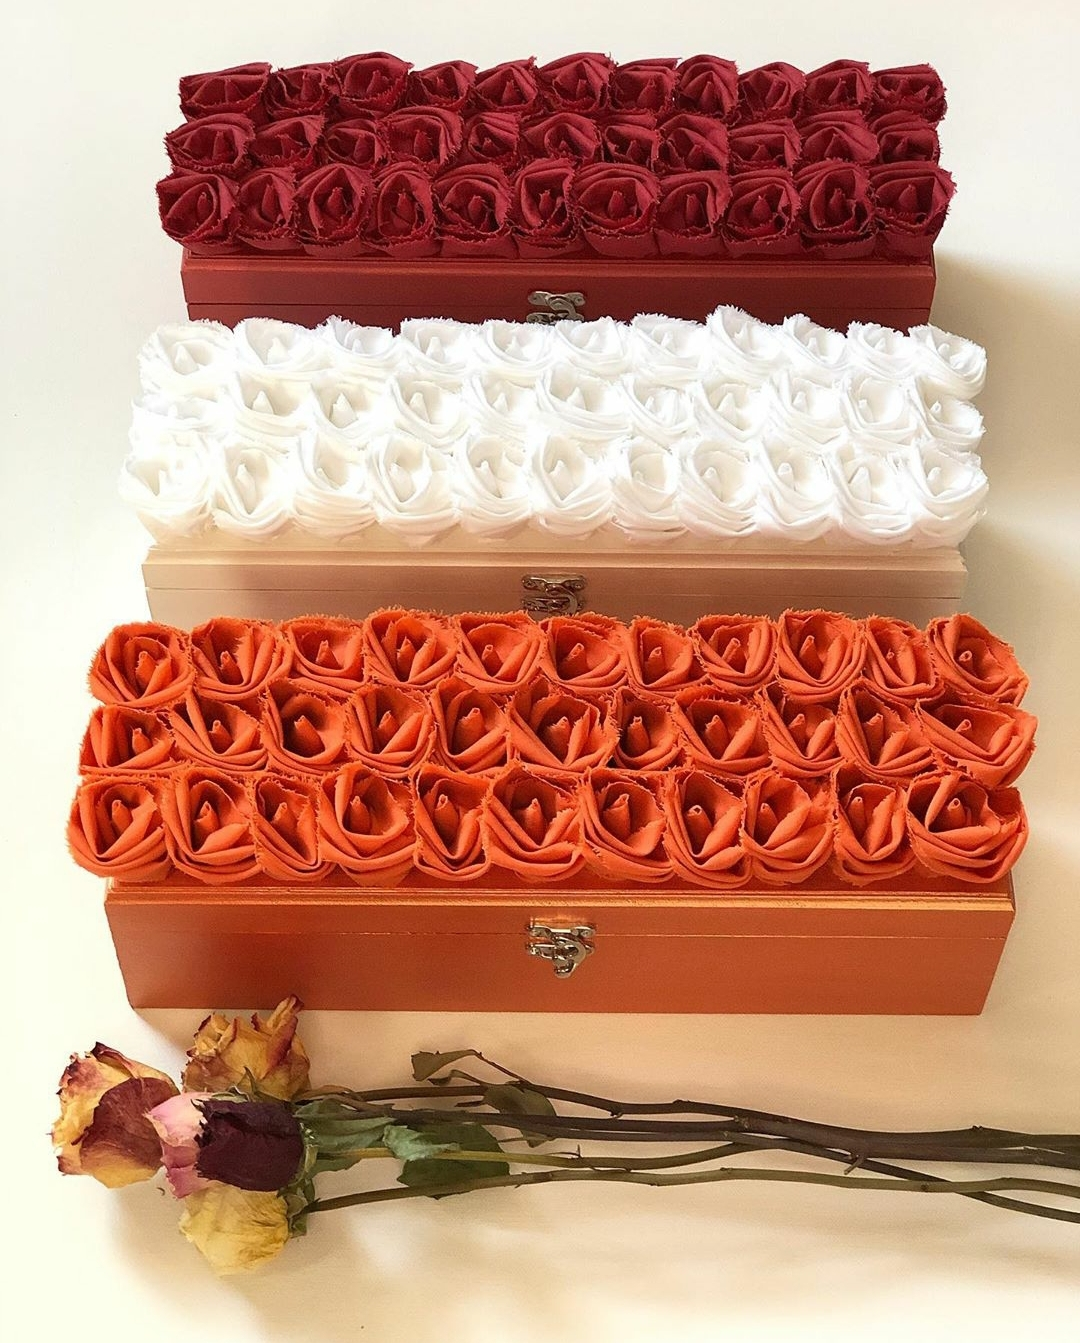 #rosememoriesdesigns #ANDREACLAY0509 #kalvinarailias #rose #winebox #gifts #wineboxes #arizona #peoriaaz #phoenixaz #scottsdaleaz #tempeaz #mesaaz #glendaleaz #chandleraz #tucsonaz #scottsdalearizona #paysonaz #prescottaz #yumaaz #sedonaaz #roseshop #florals #floral #